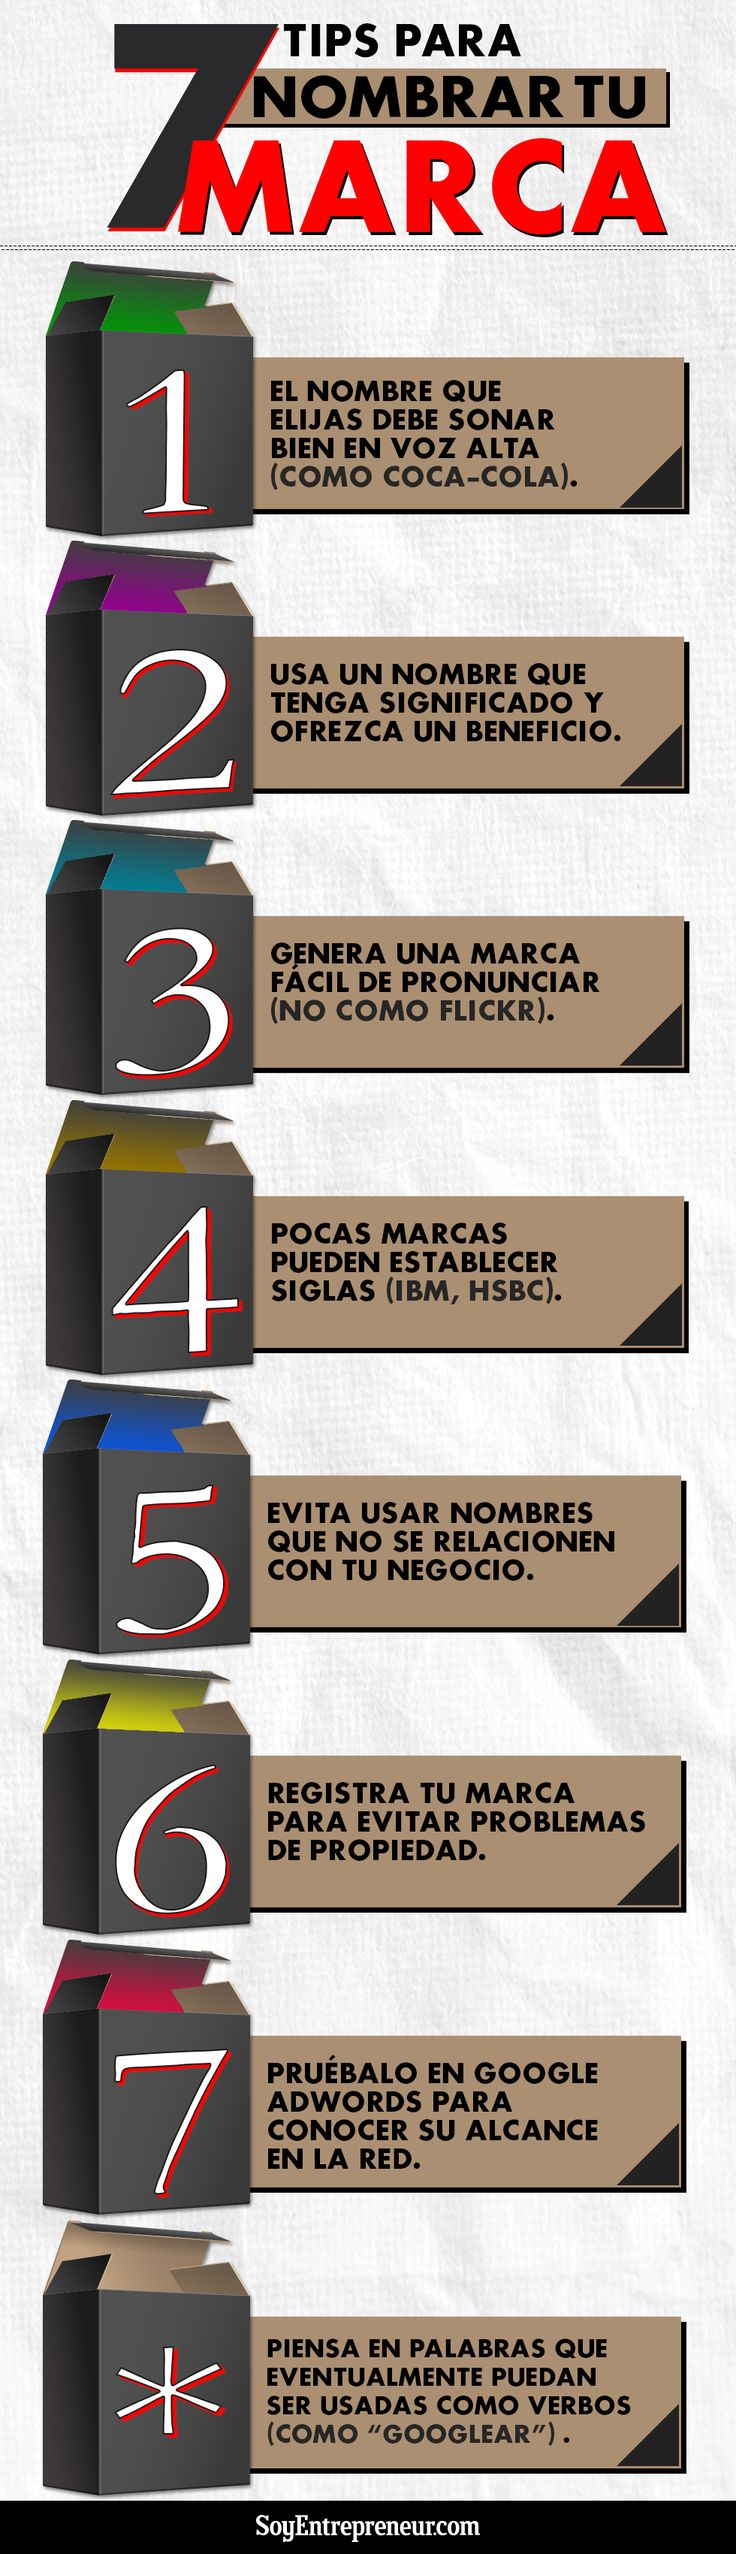 7 CONSEJOS PARA NOMBRAR TU MARCA #INFOGRAFIA #INFOGRAPHIC #MARKETING